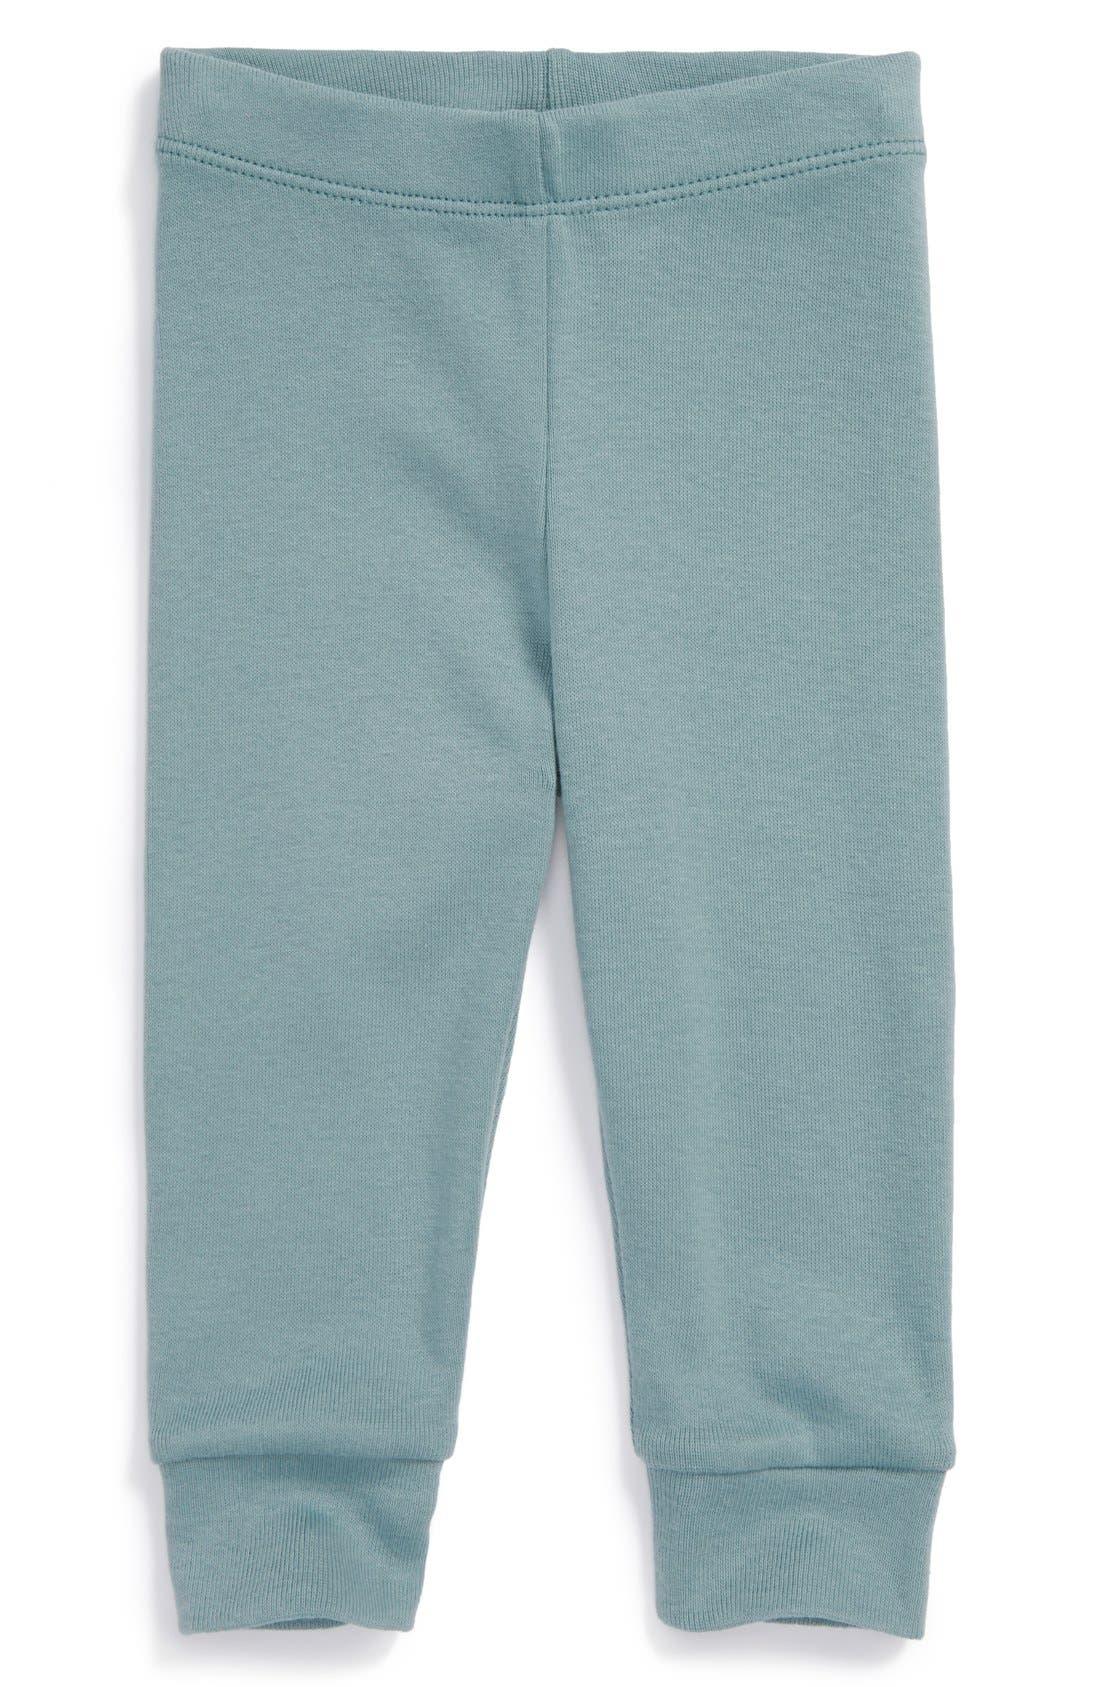 Main Image - Tea Collection Rib Knit Pants (Baby Boys)